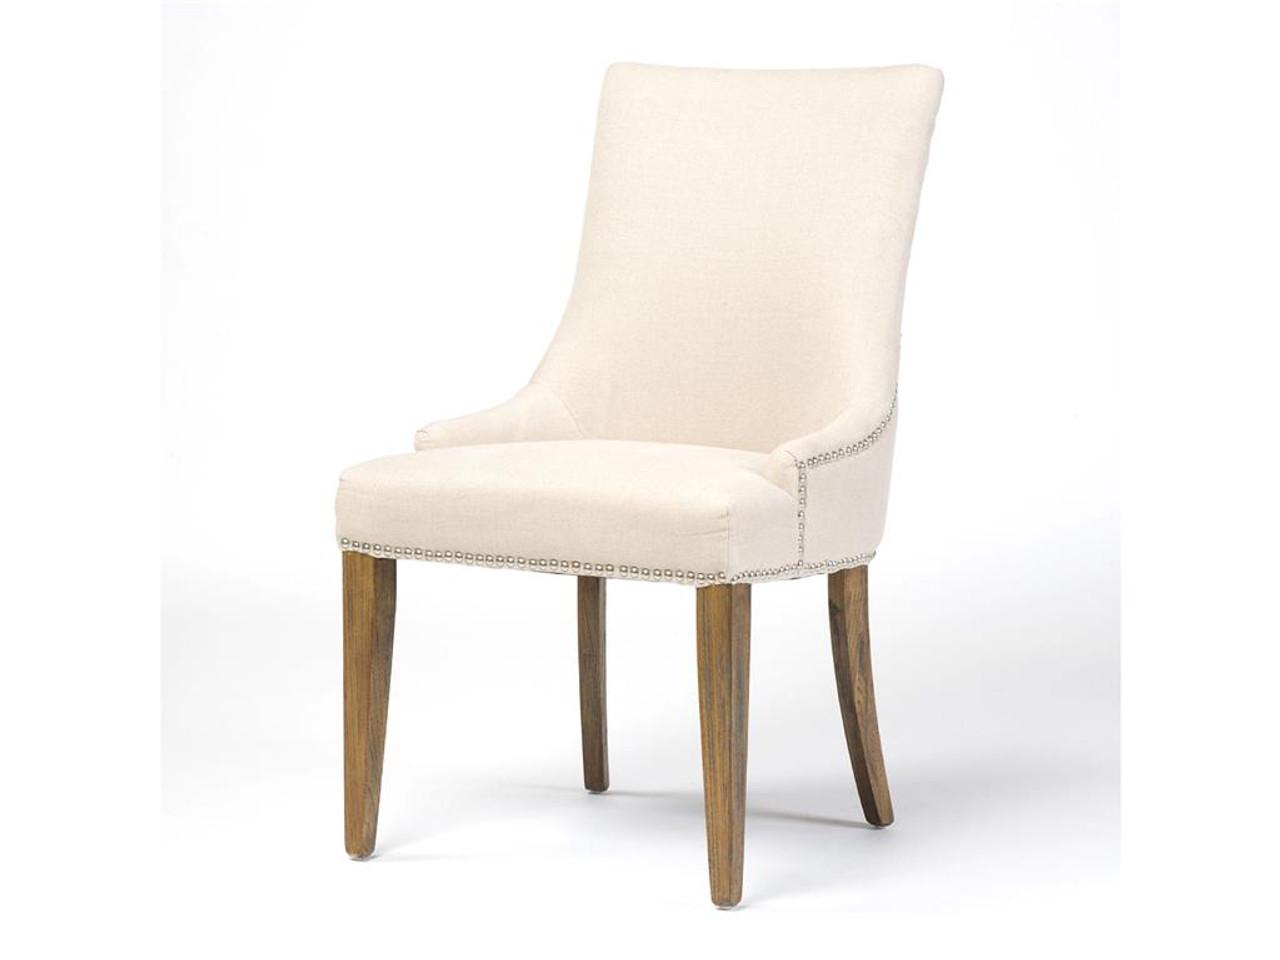 nailhead upholstered dining chair living room chairs walmart ashford linen zin home